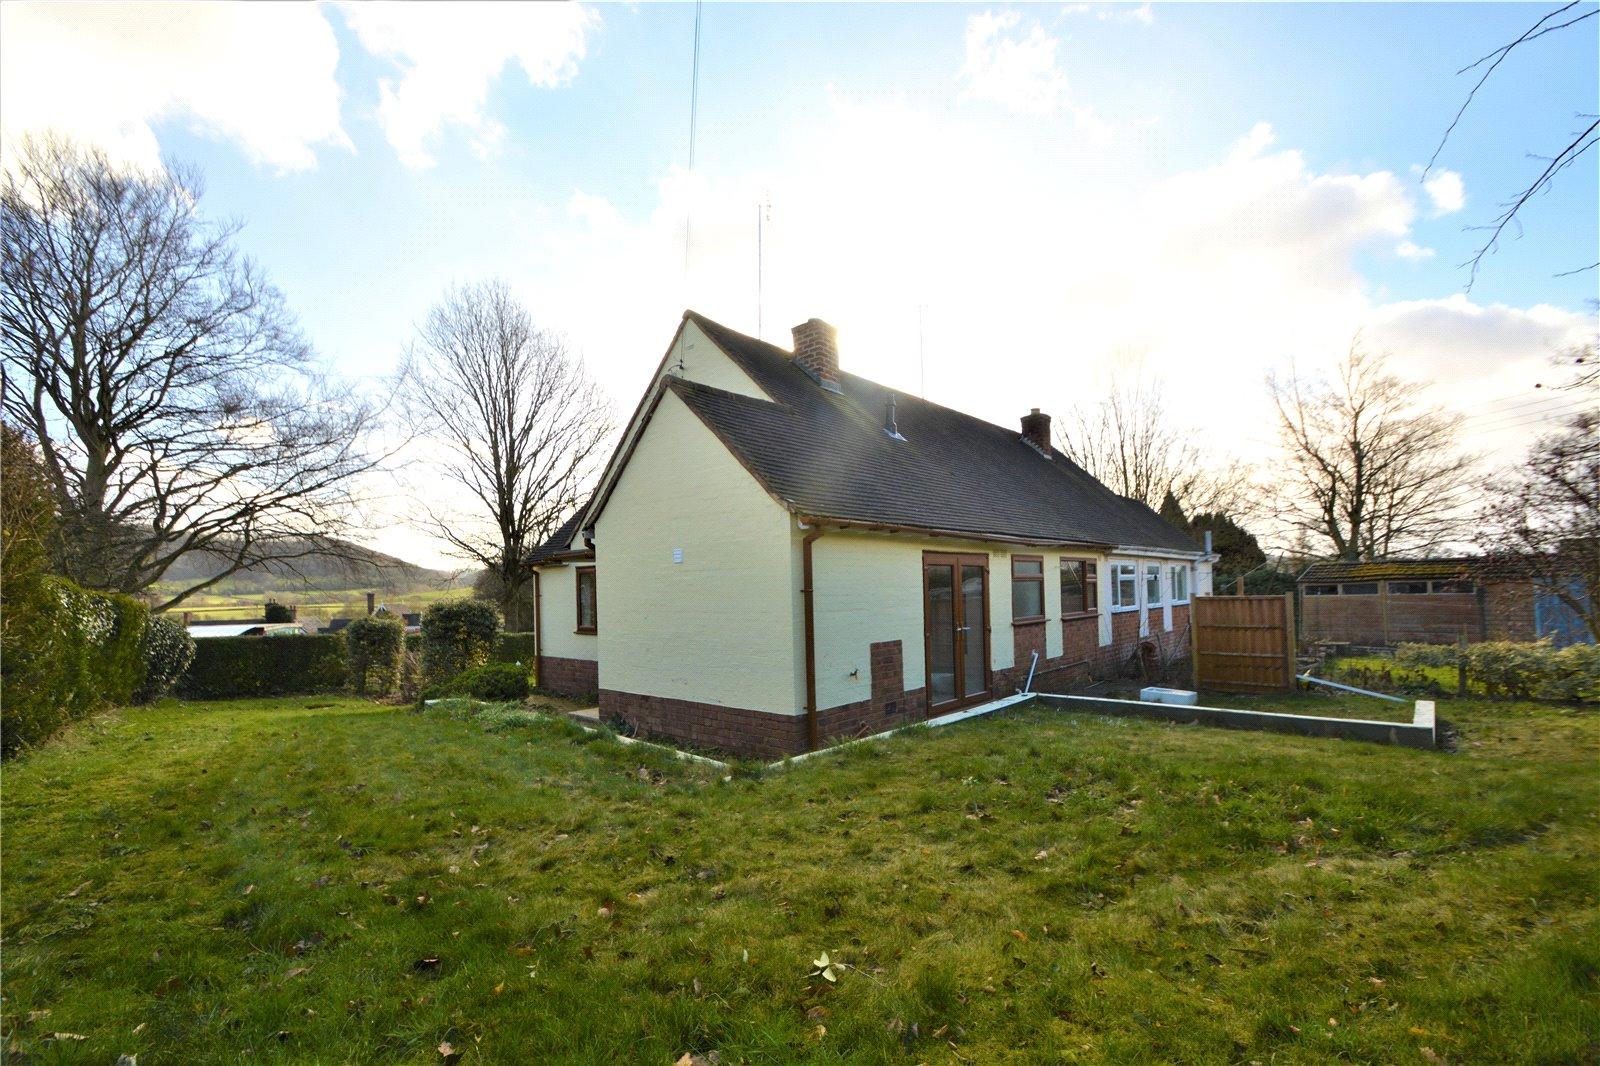 2 Bedrooms Semi Detached Bungalow for sale in 35 Park View, Buildwas, Shropshire, TF8